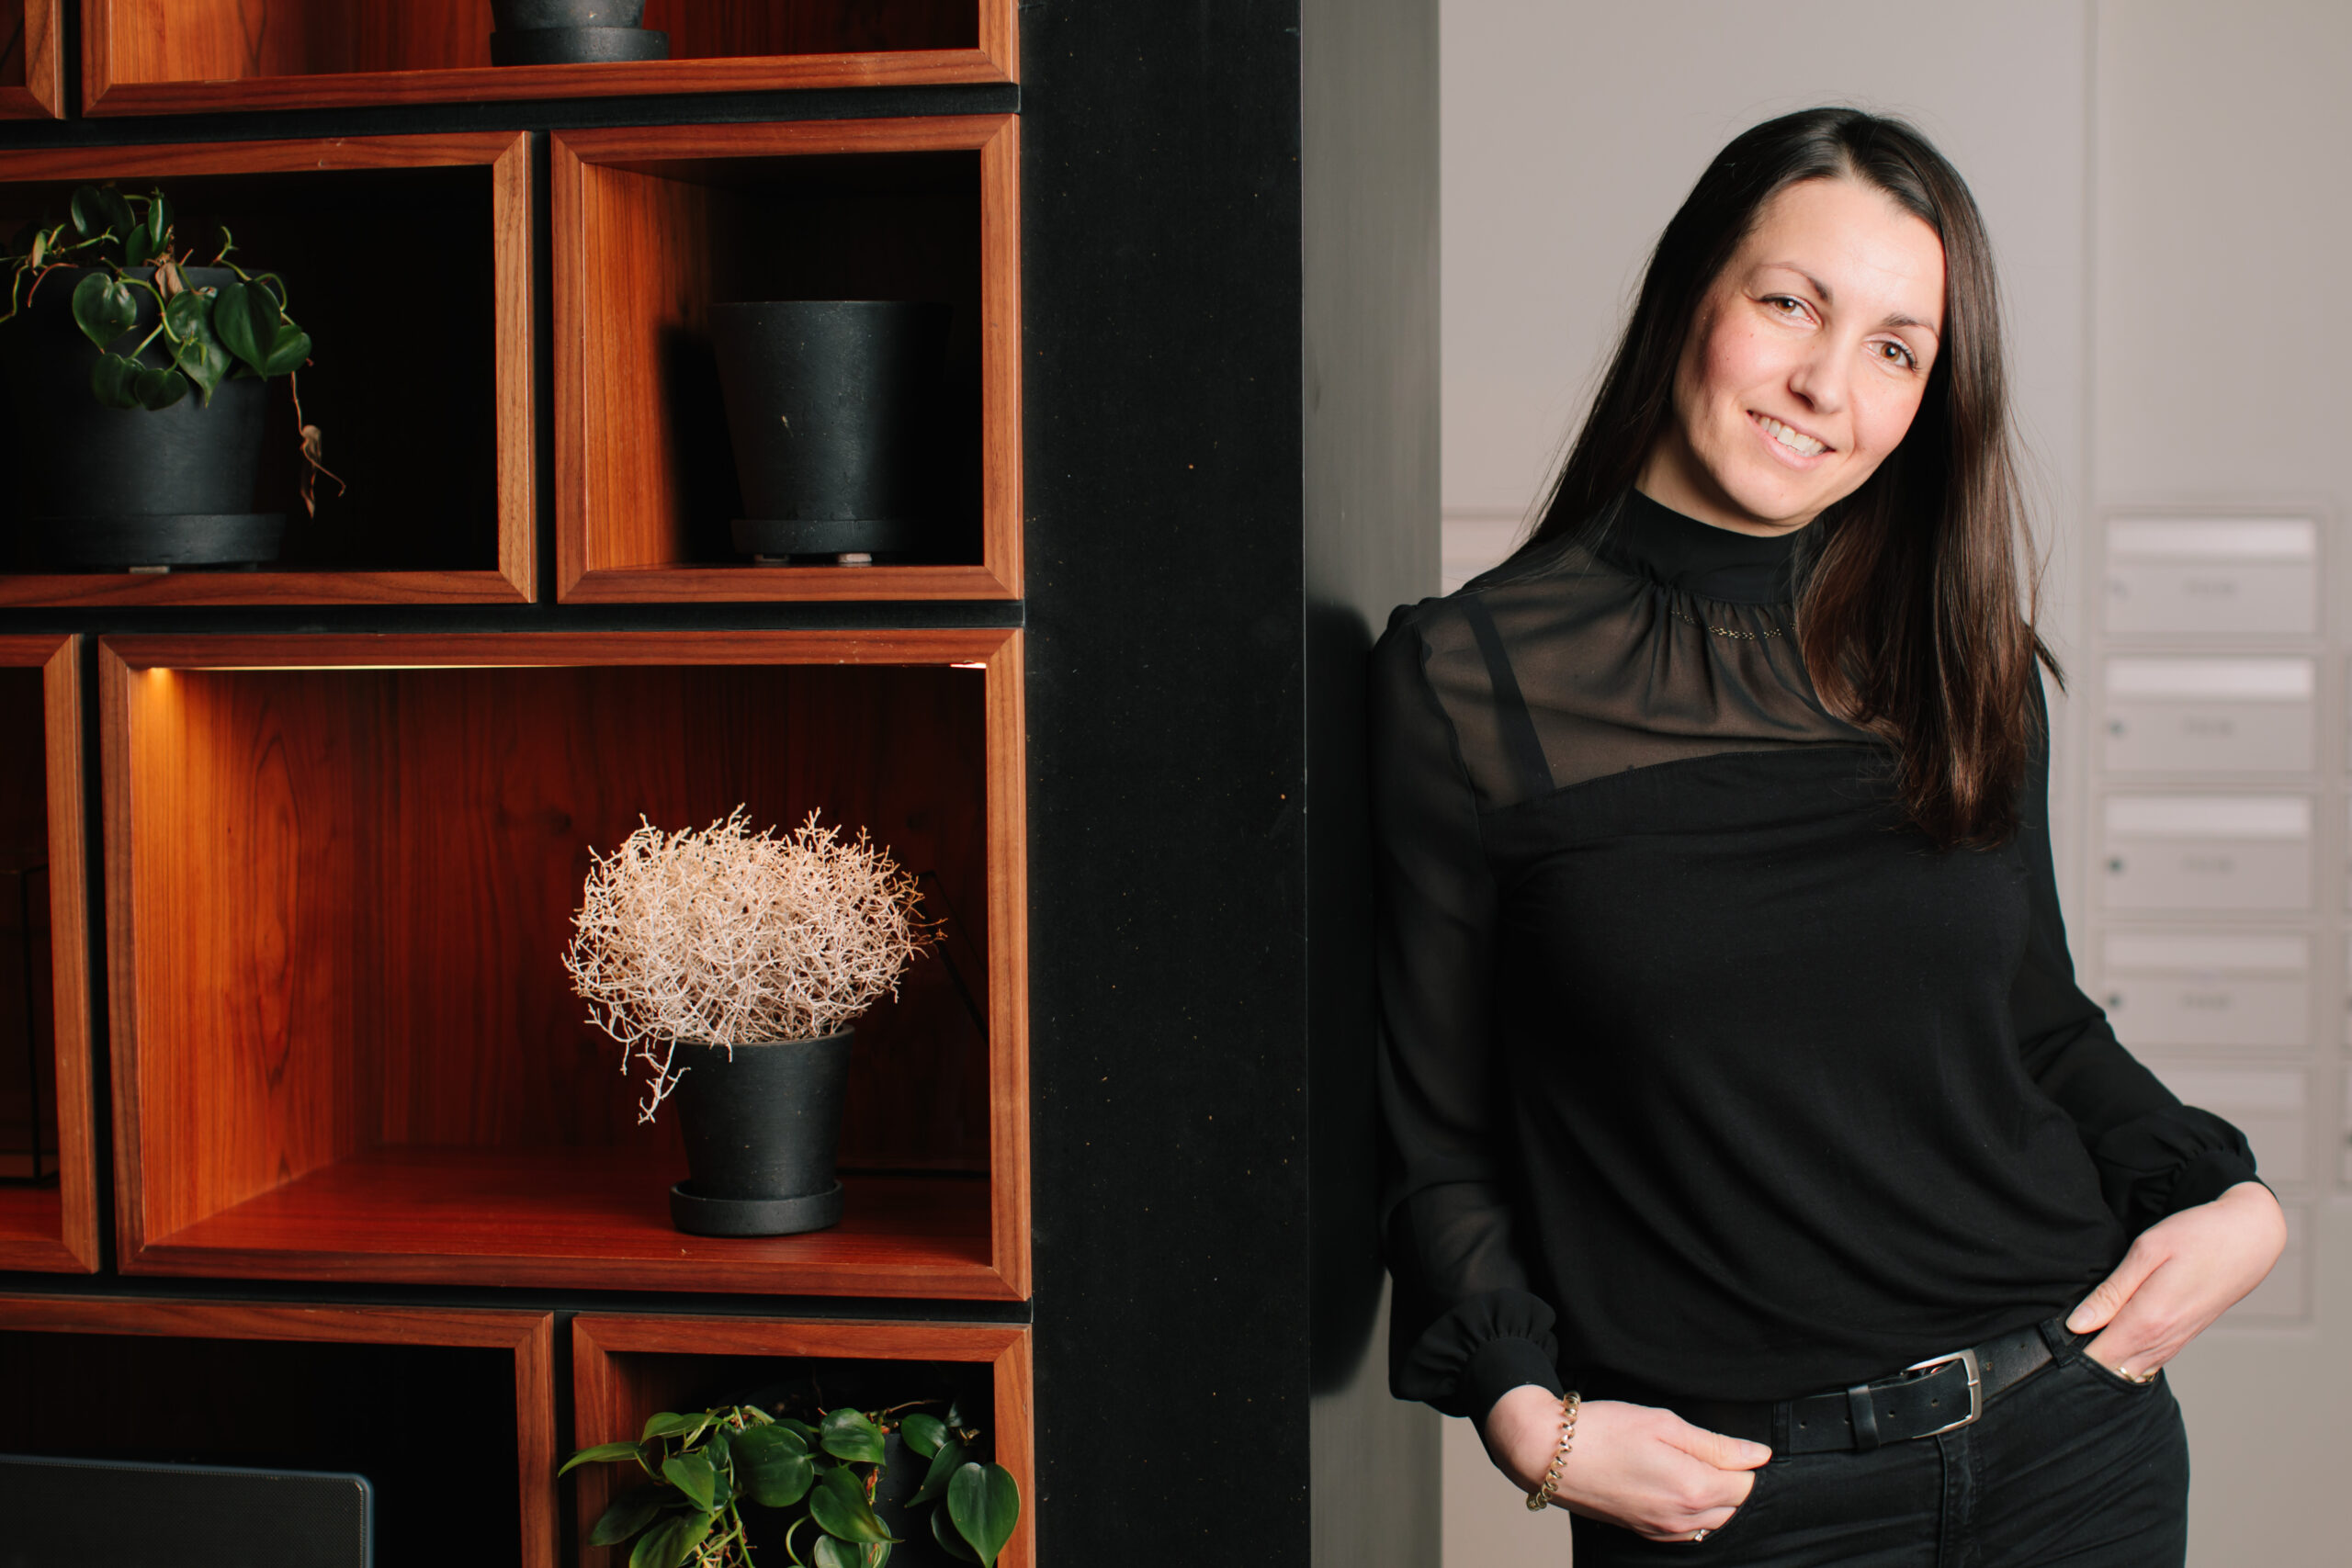 Katarina Ondrovicova